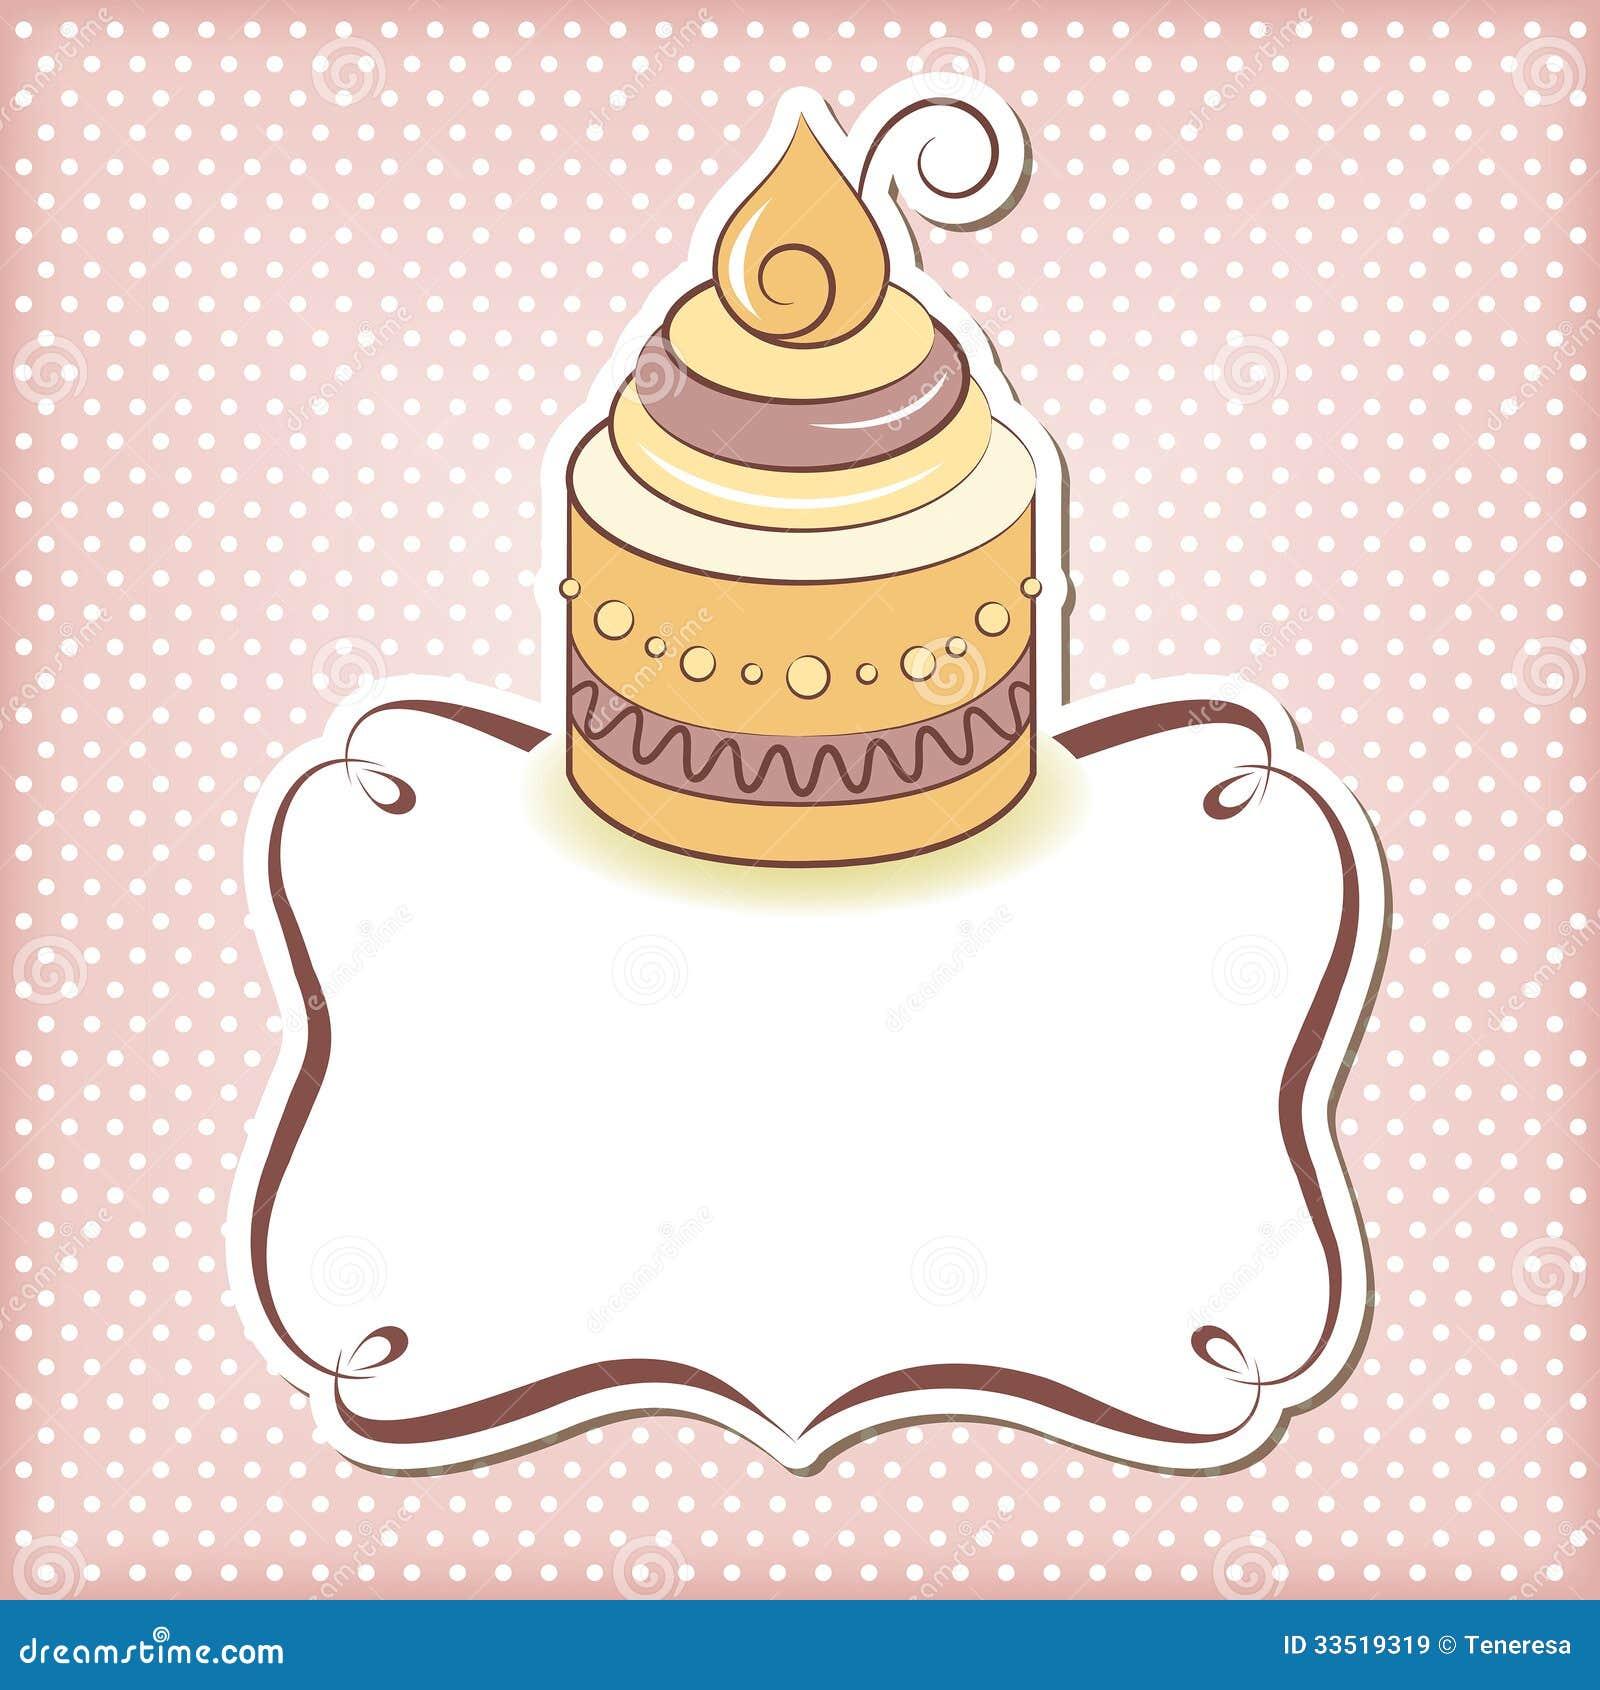 Cute cupcake frame. Cute cupcake frame. Editable vector illustration.